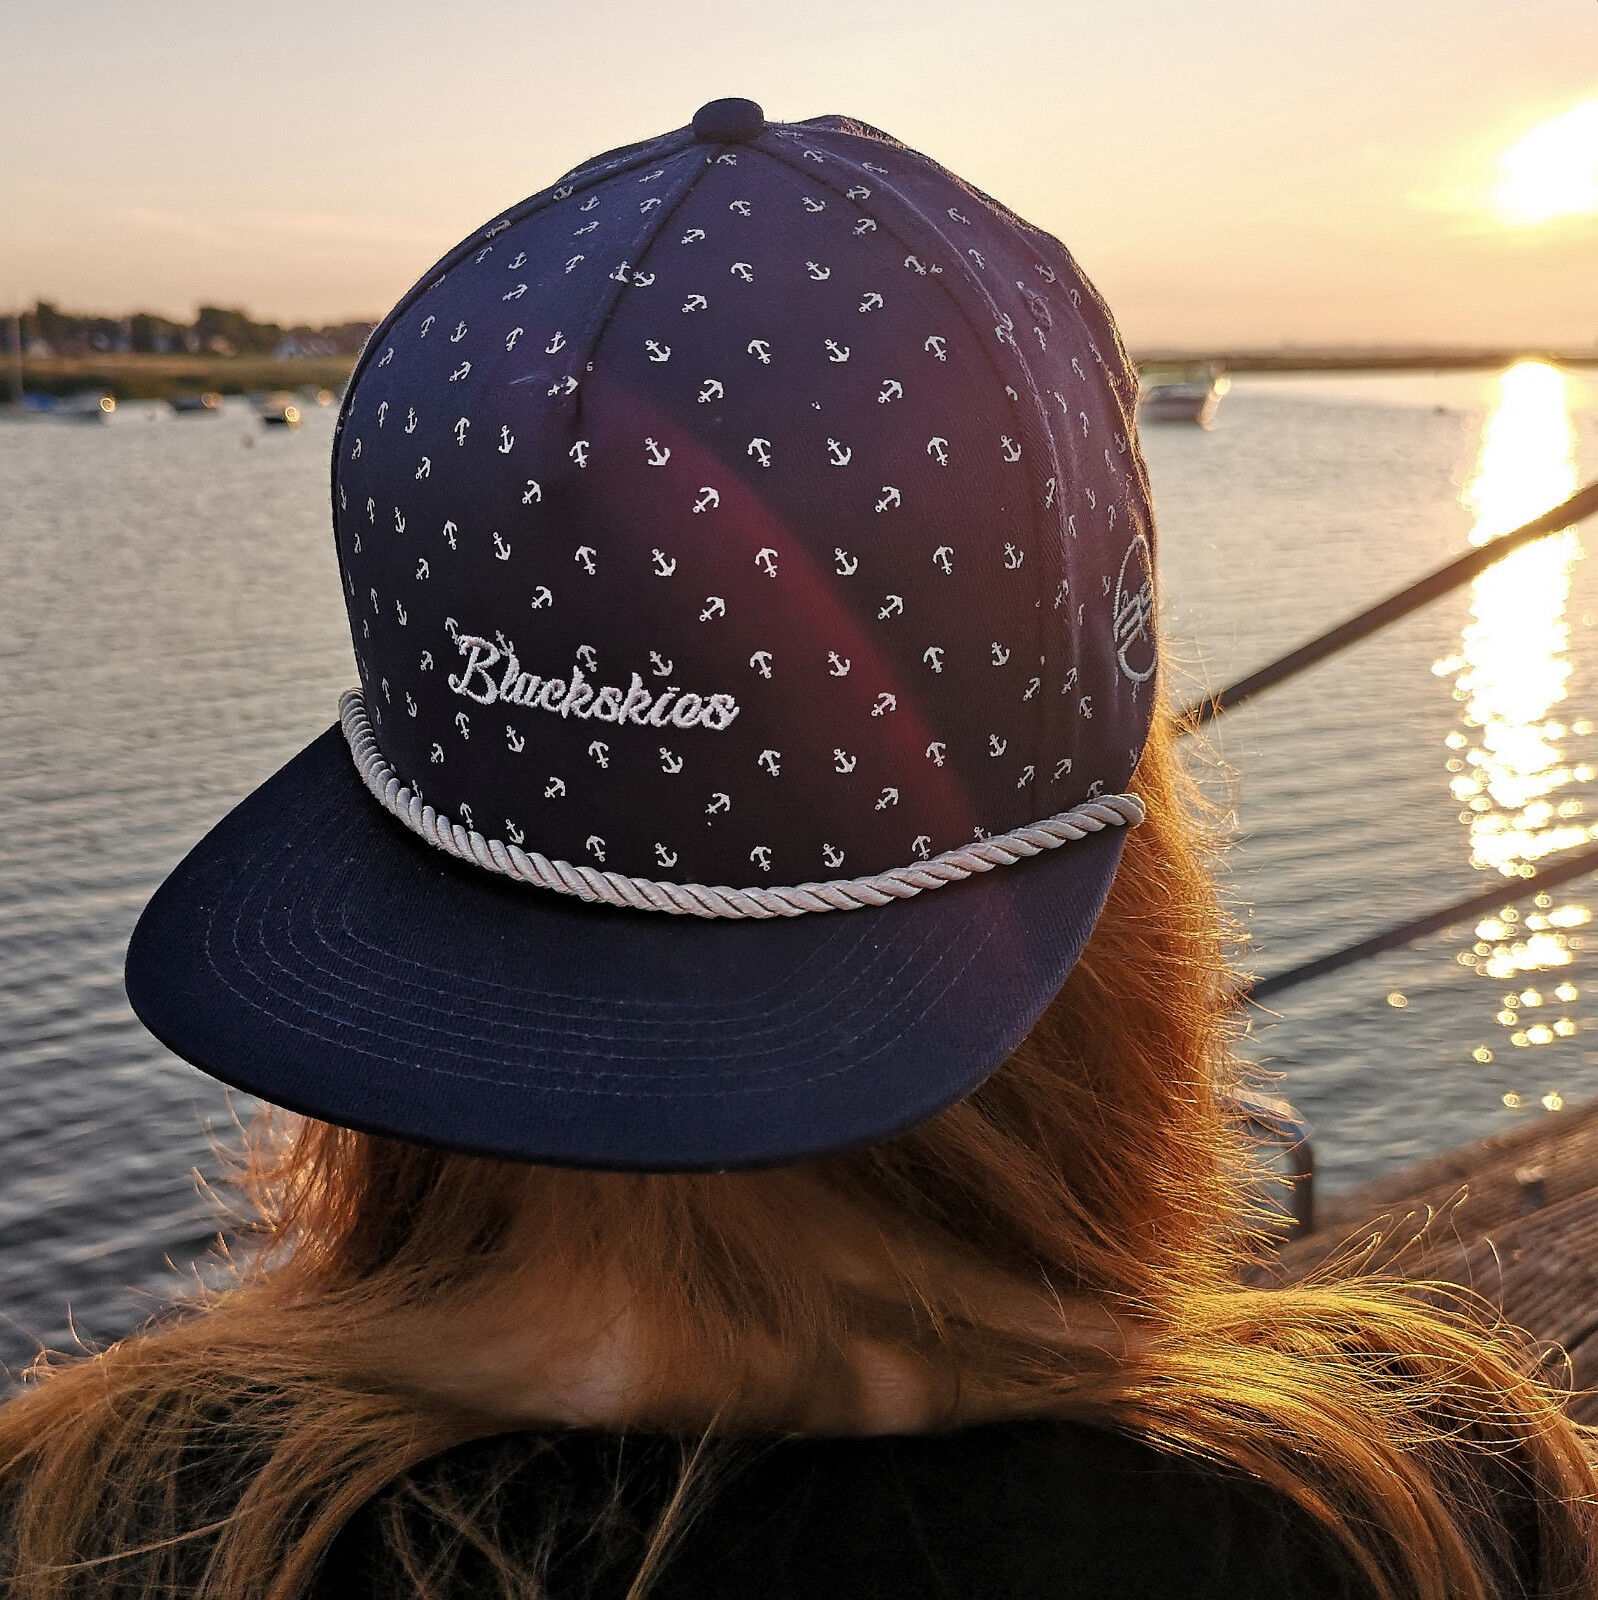 Blackskies Harbor Snapback Cap Mütze Baseball Kappe Basecap Anker Cappy Maritim